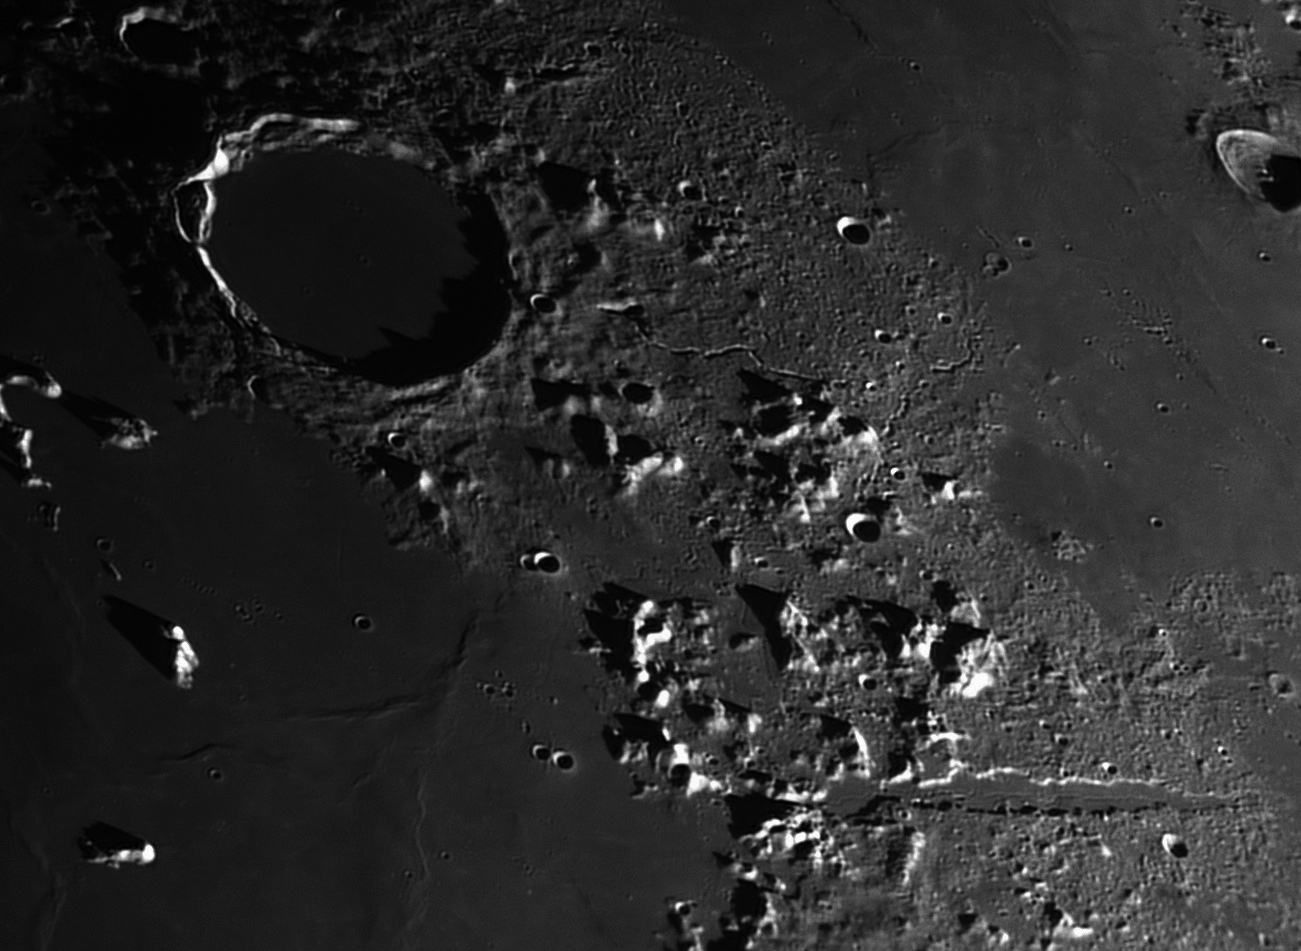 Moon_202728_lapl4_ap298 faille 3.jpg